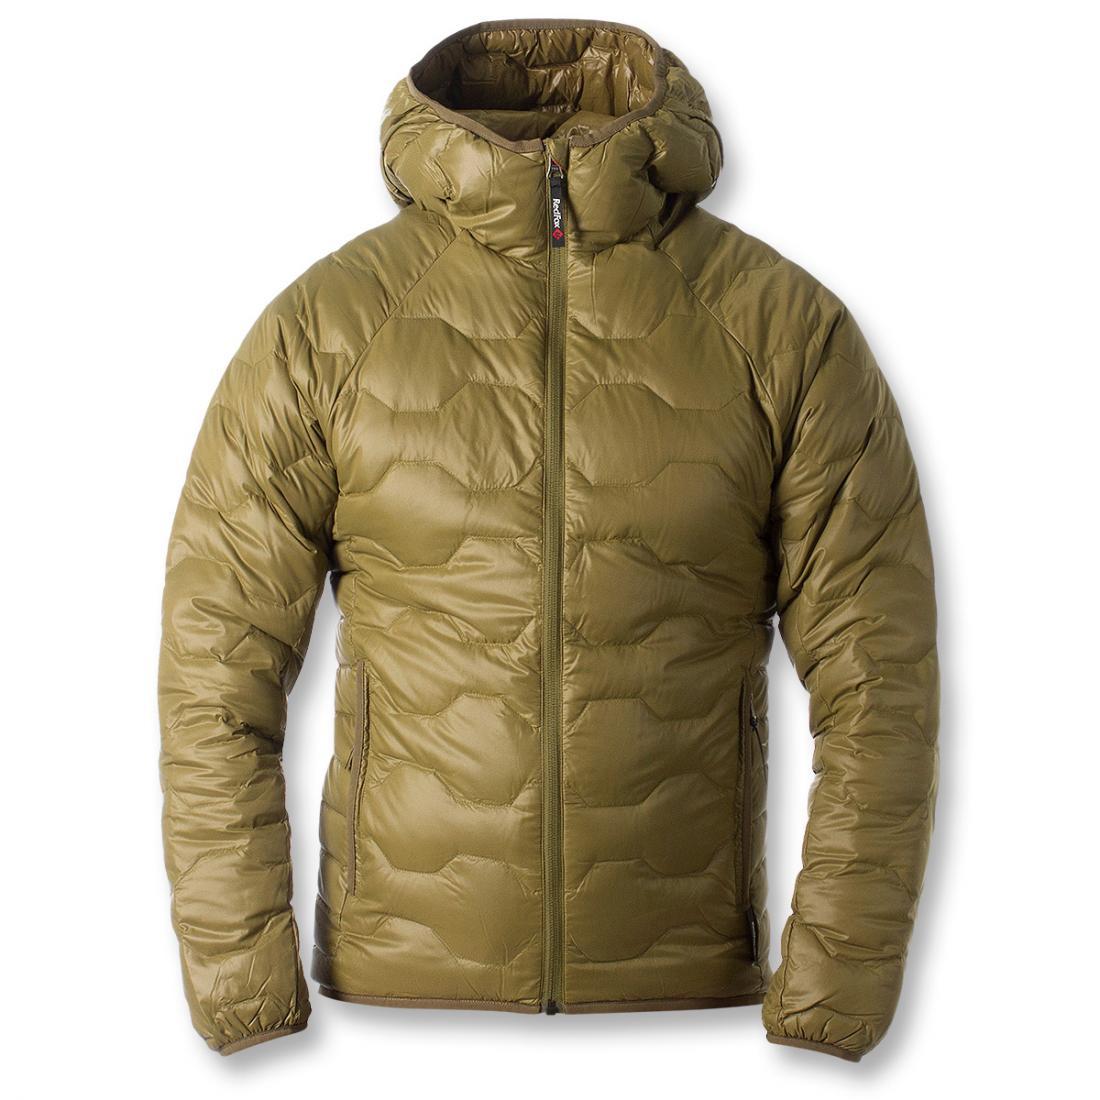 Куртка пуховая Belite III МужскаяКуртки<br><br><br>Цвет: Зеленый<br>Размер: 46